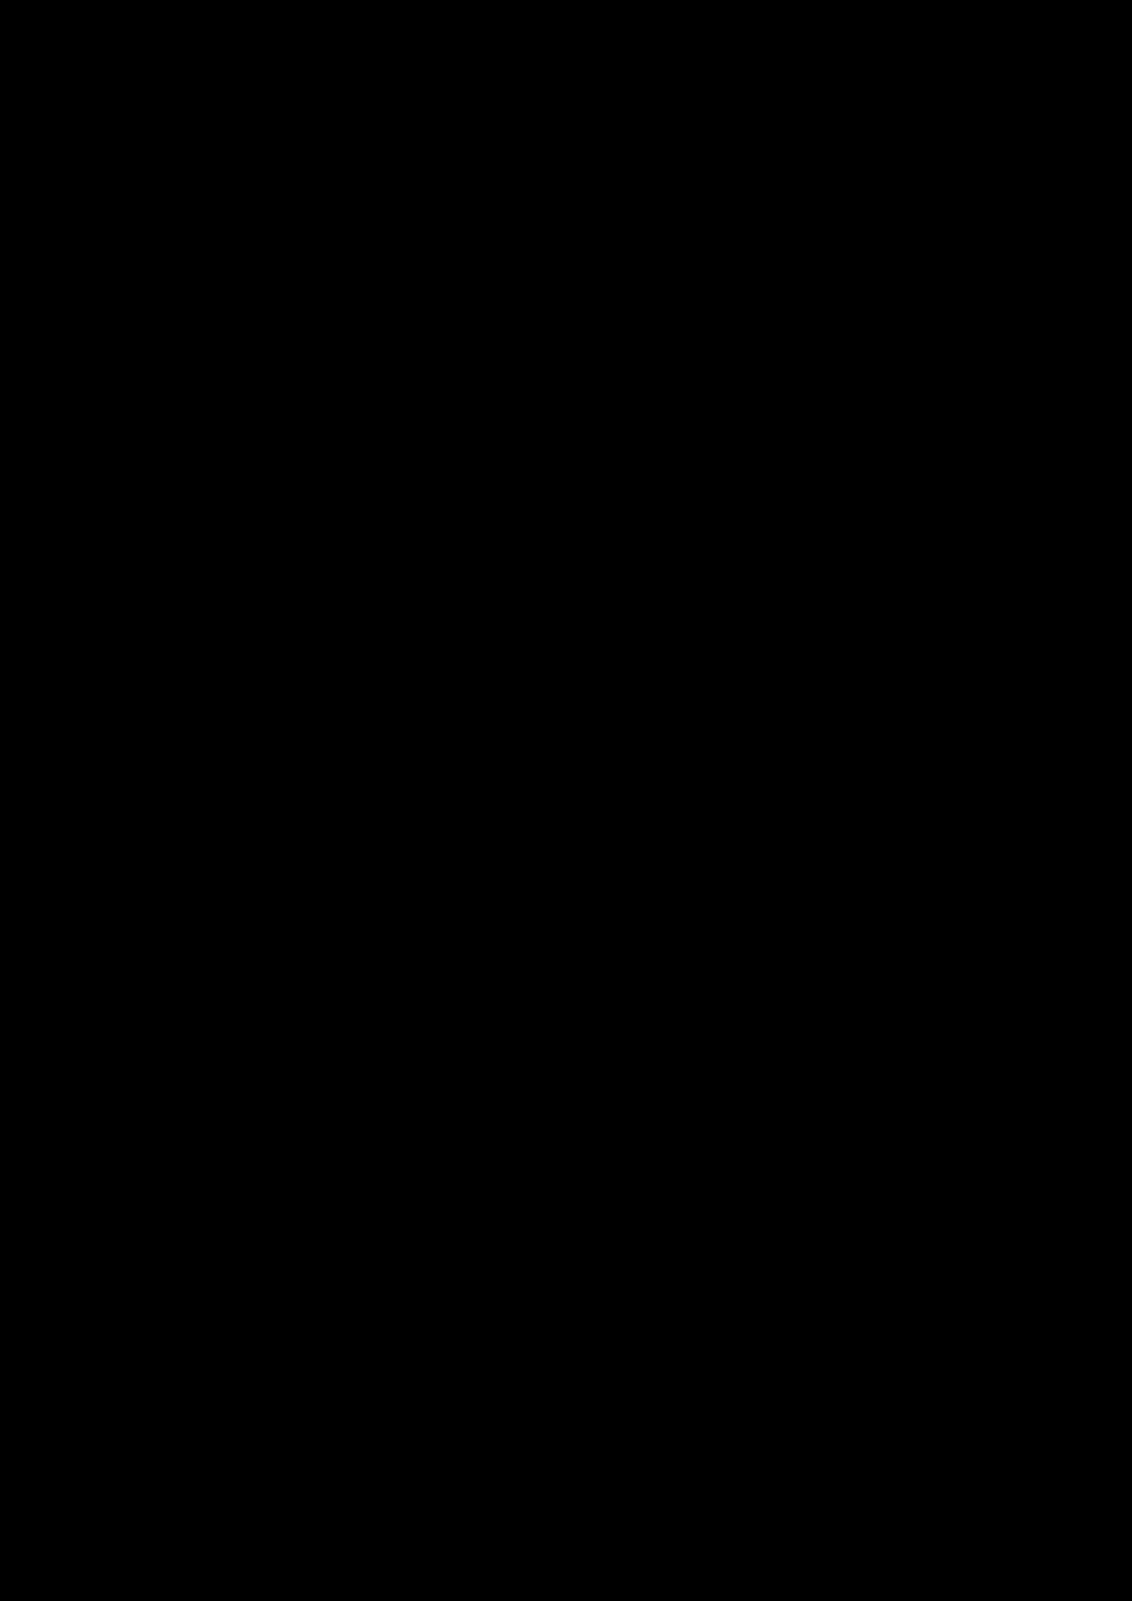 Belyiy sokol slide, Image 18